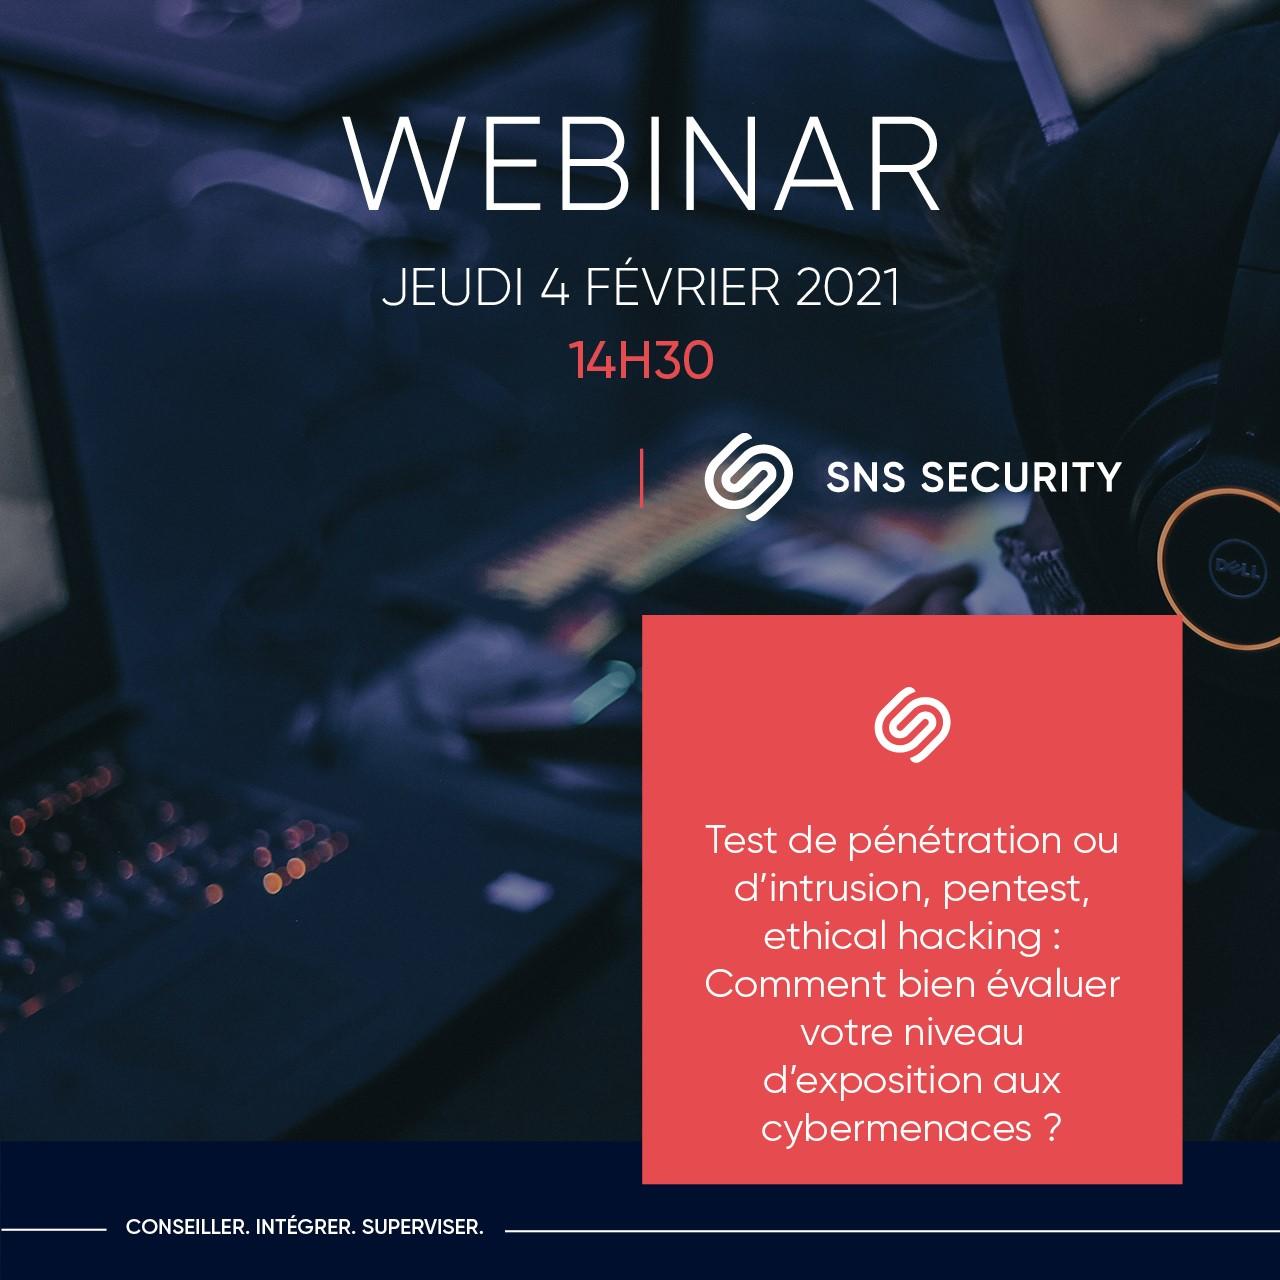 webinar sns security pentest test d'intrusion ethical hacking